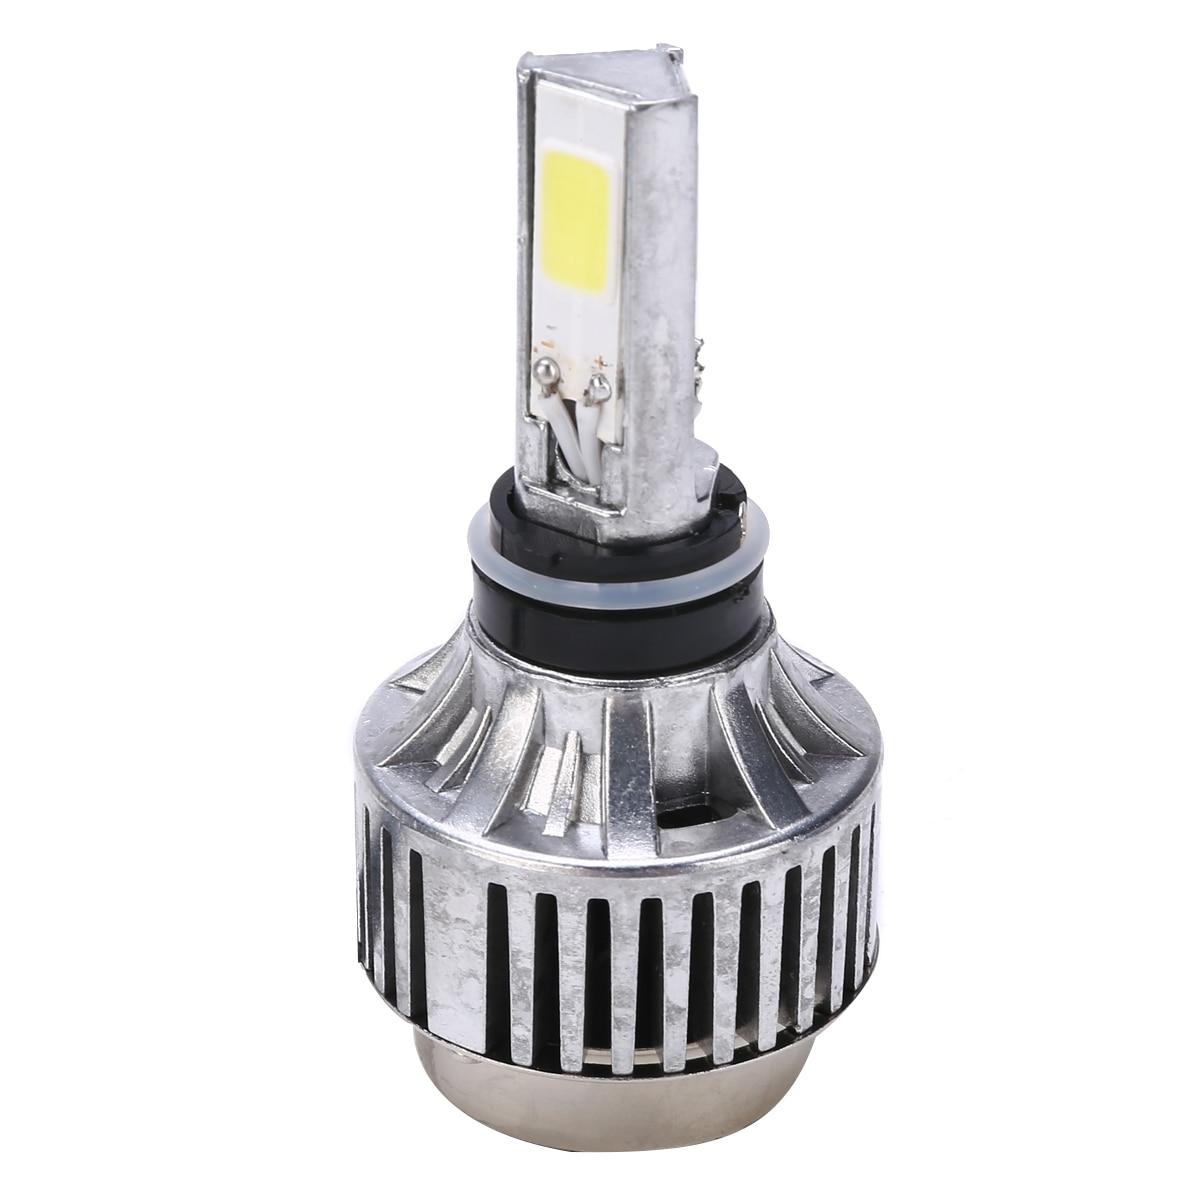 Treyues 1 Set H4 BA20D Hi Lo 40W 26W Beam Motorcycle Headlight 6500K LED High Quality Front Lamp Bulb